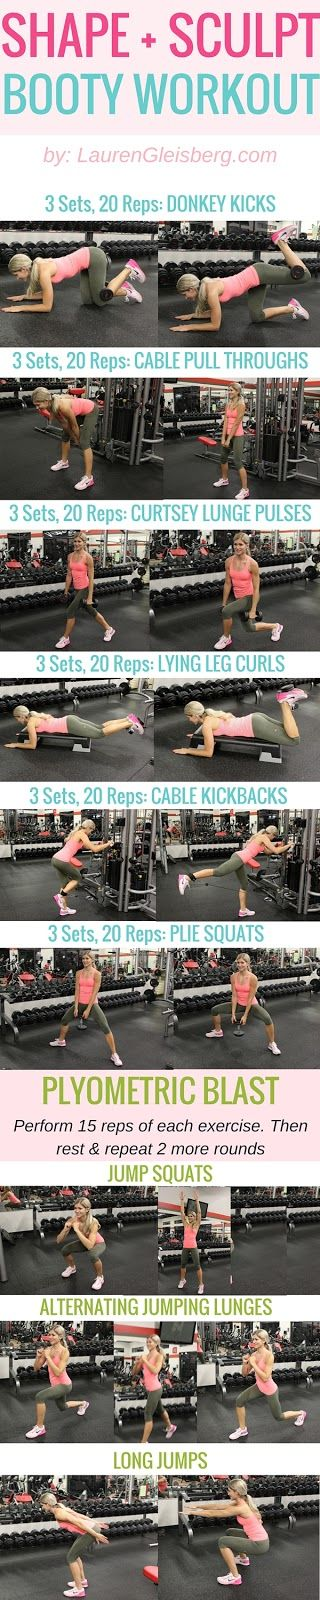 SHAPE & SCULPT LEGS & BOOTY WEIGH TRAINING WORKOUT #LGBeautyAndBooty Challenge Week 3, Day 1 by LaurenGleisberg.com